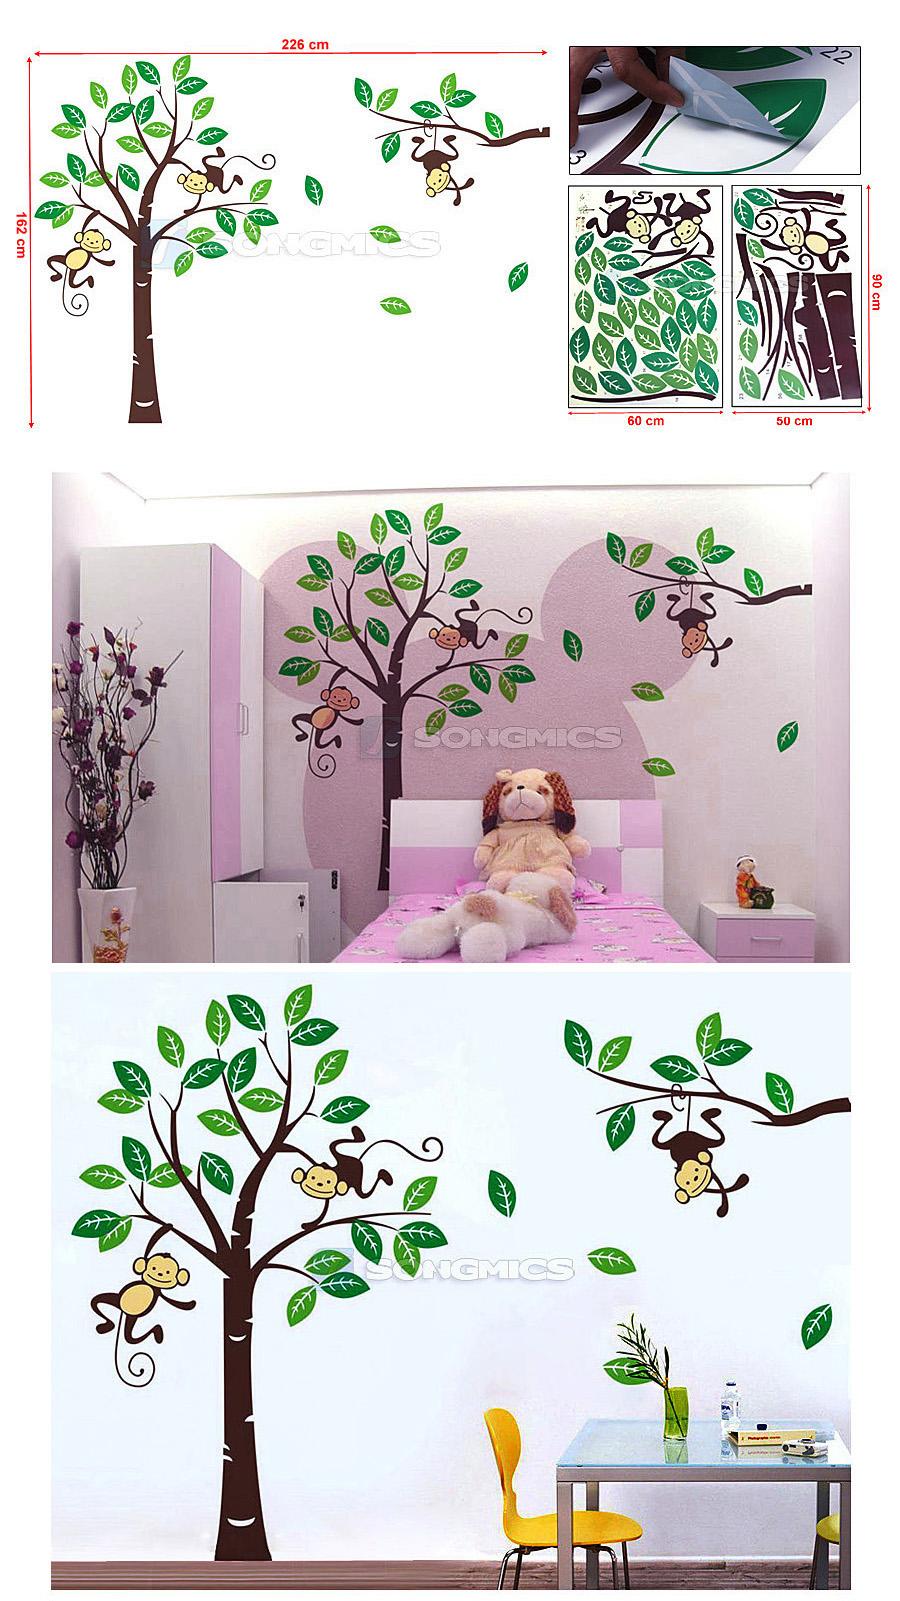 wandaufkleber gro e b ume affen f r kinderzimmer wandtattoo wandsticker fwt17m ebay. Black Bedroom Furniture Sets. Home Design Ideas